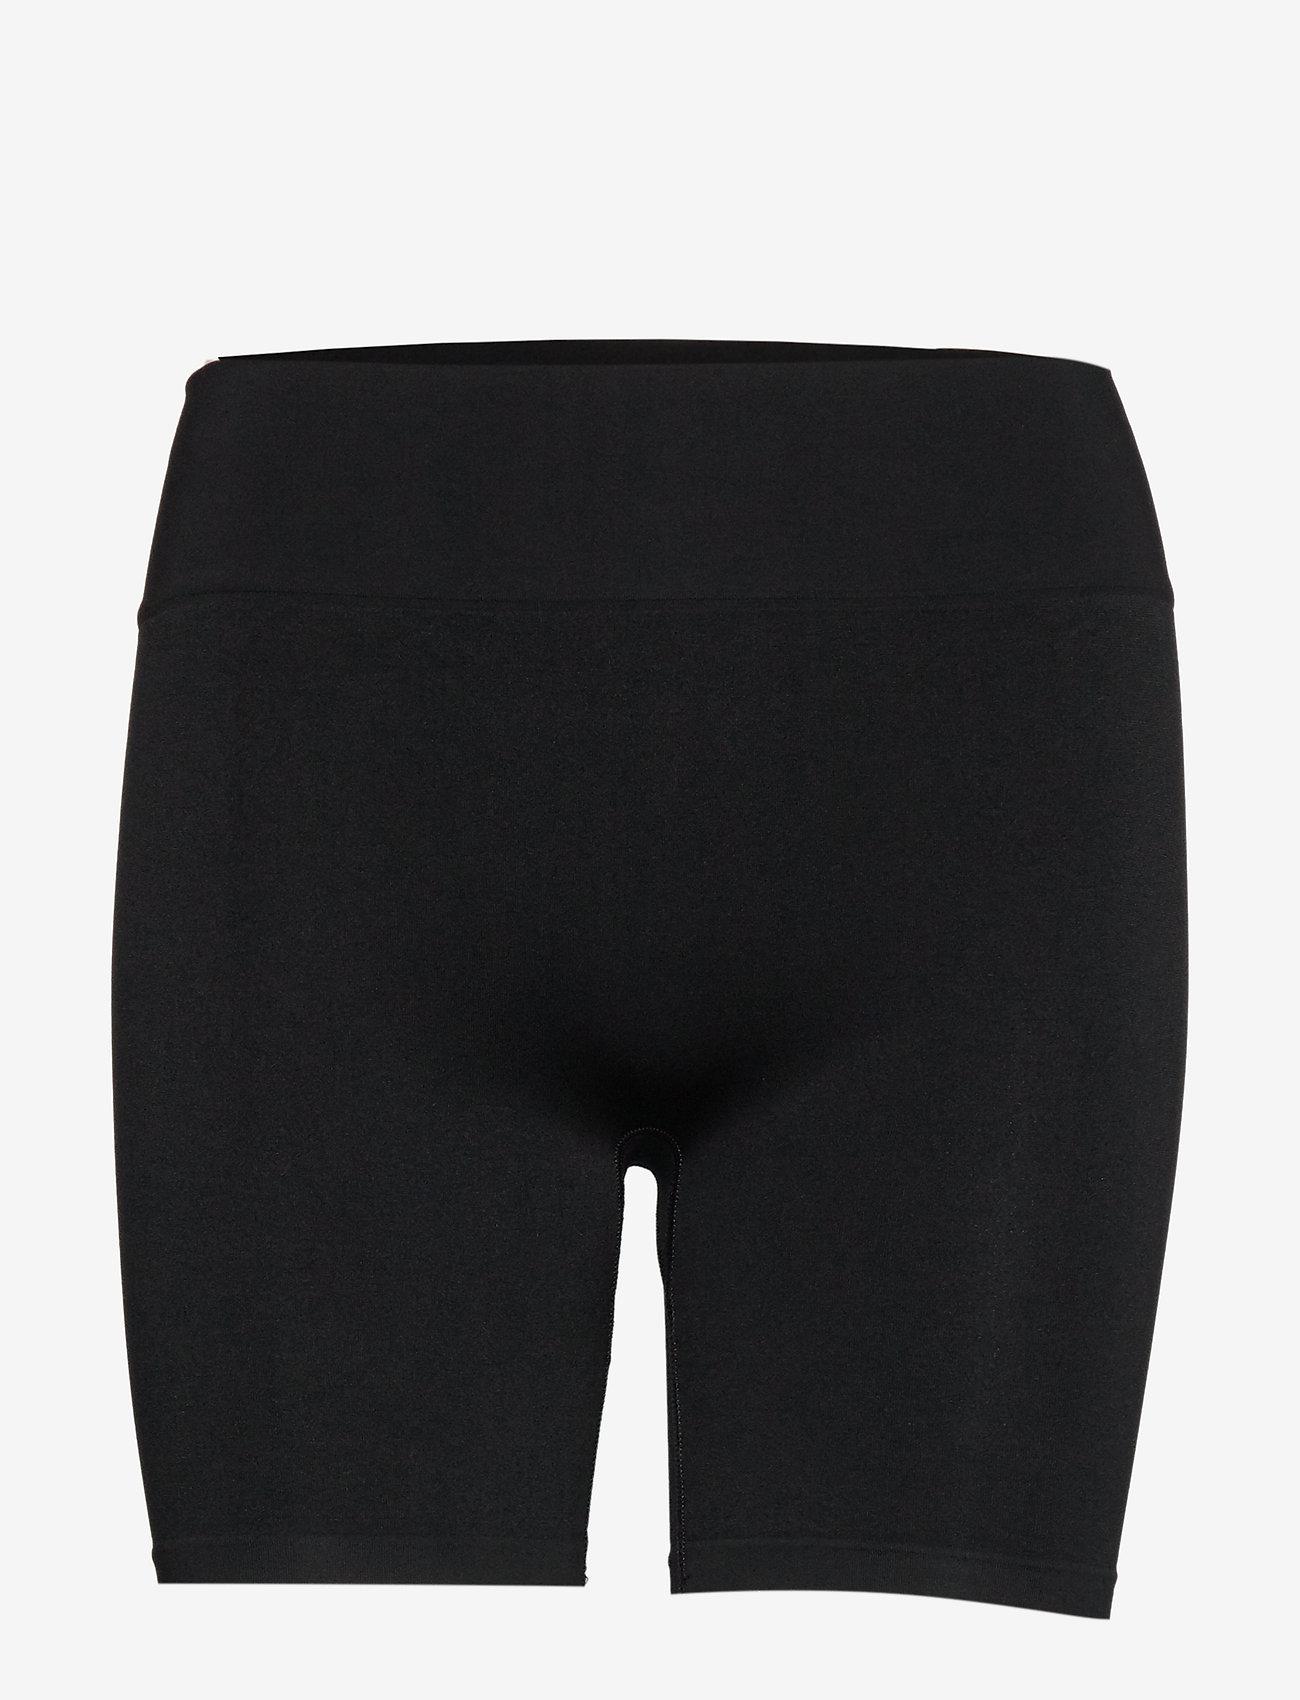 Saint Tropez - T5920, NinnaSZ Microfiber Shorts - fietsbroeken - black - 0